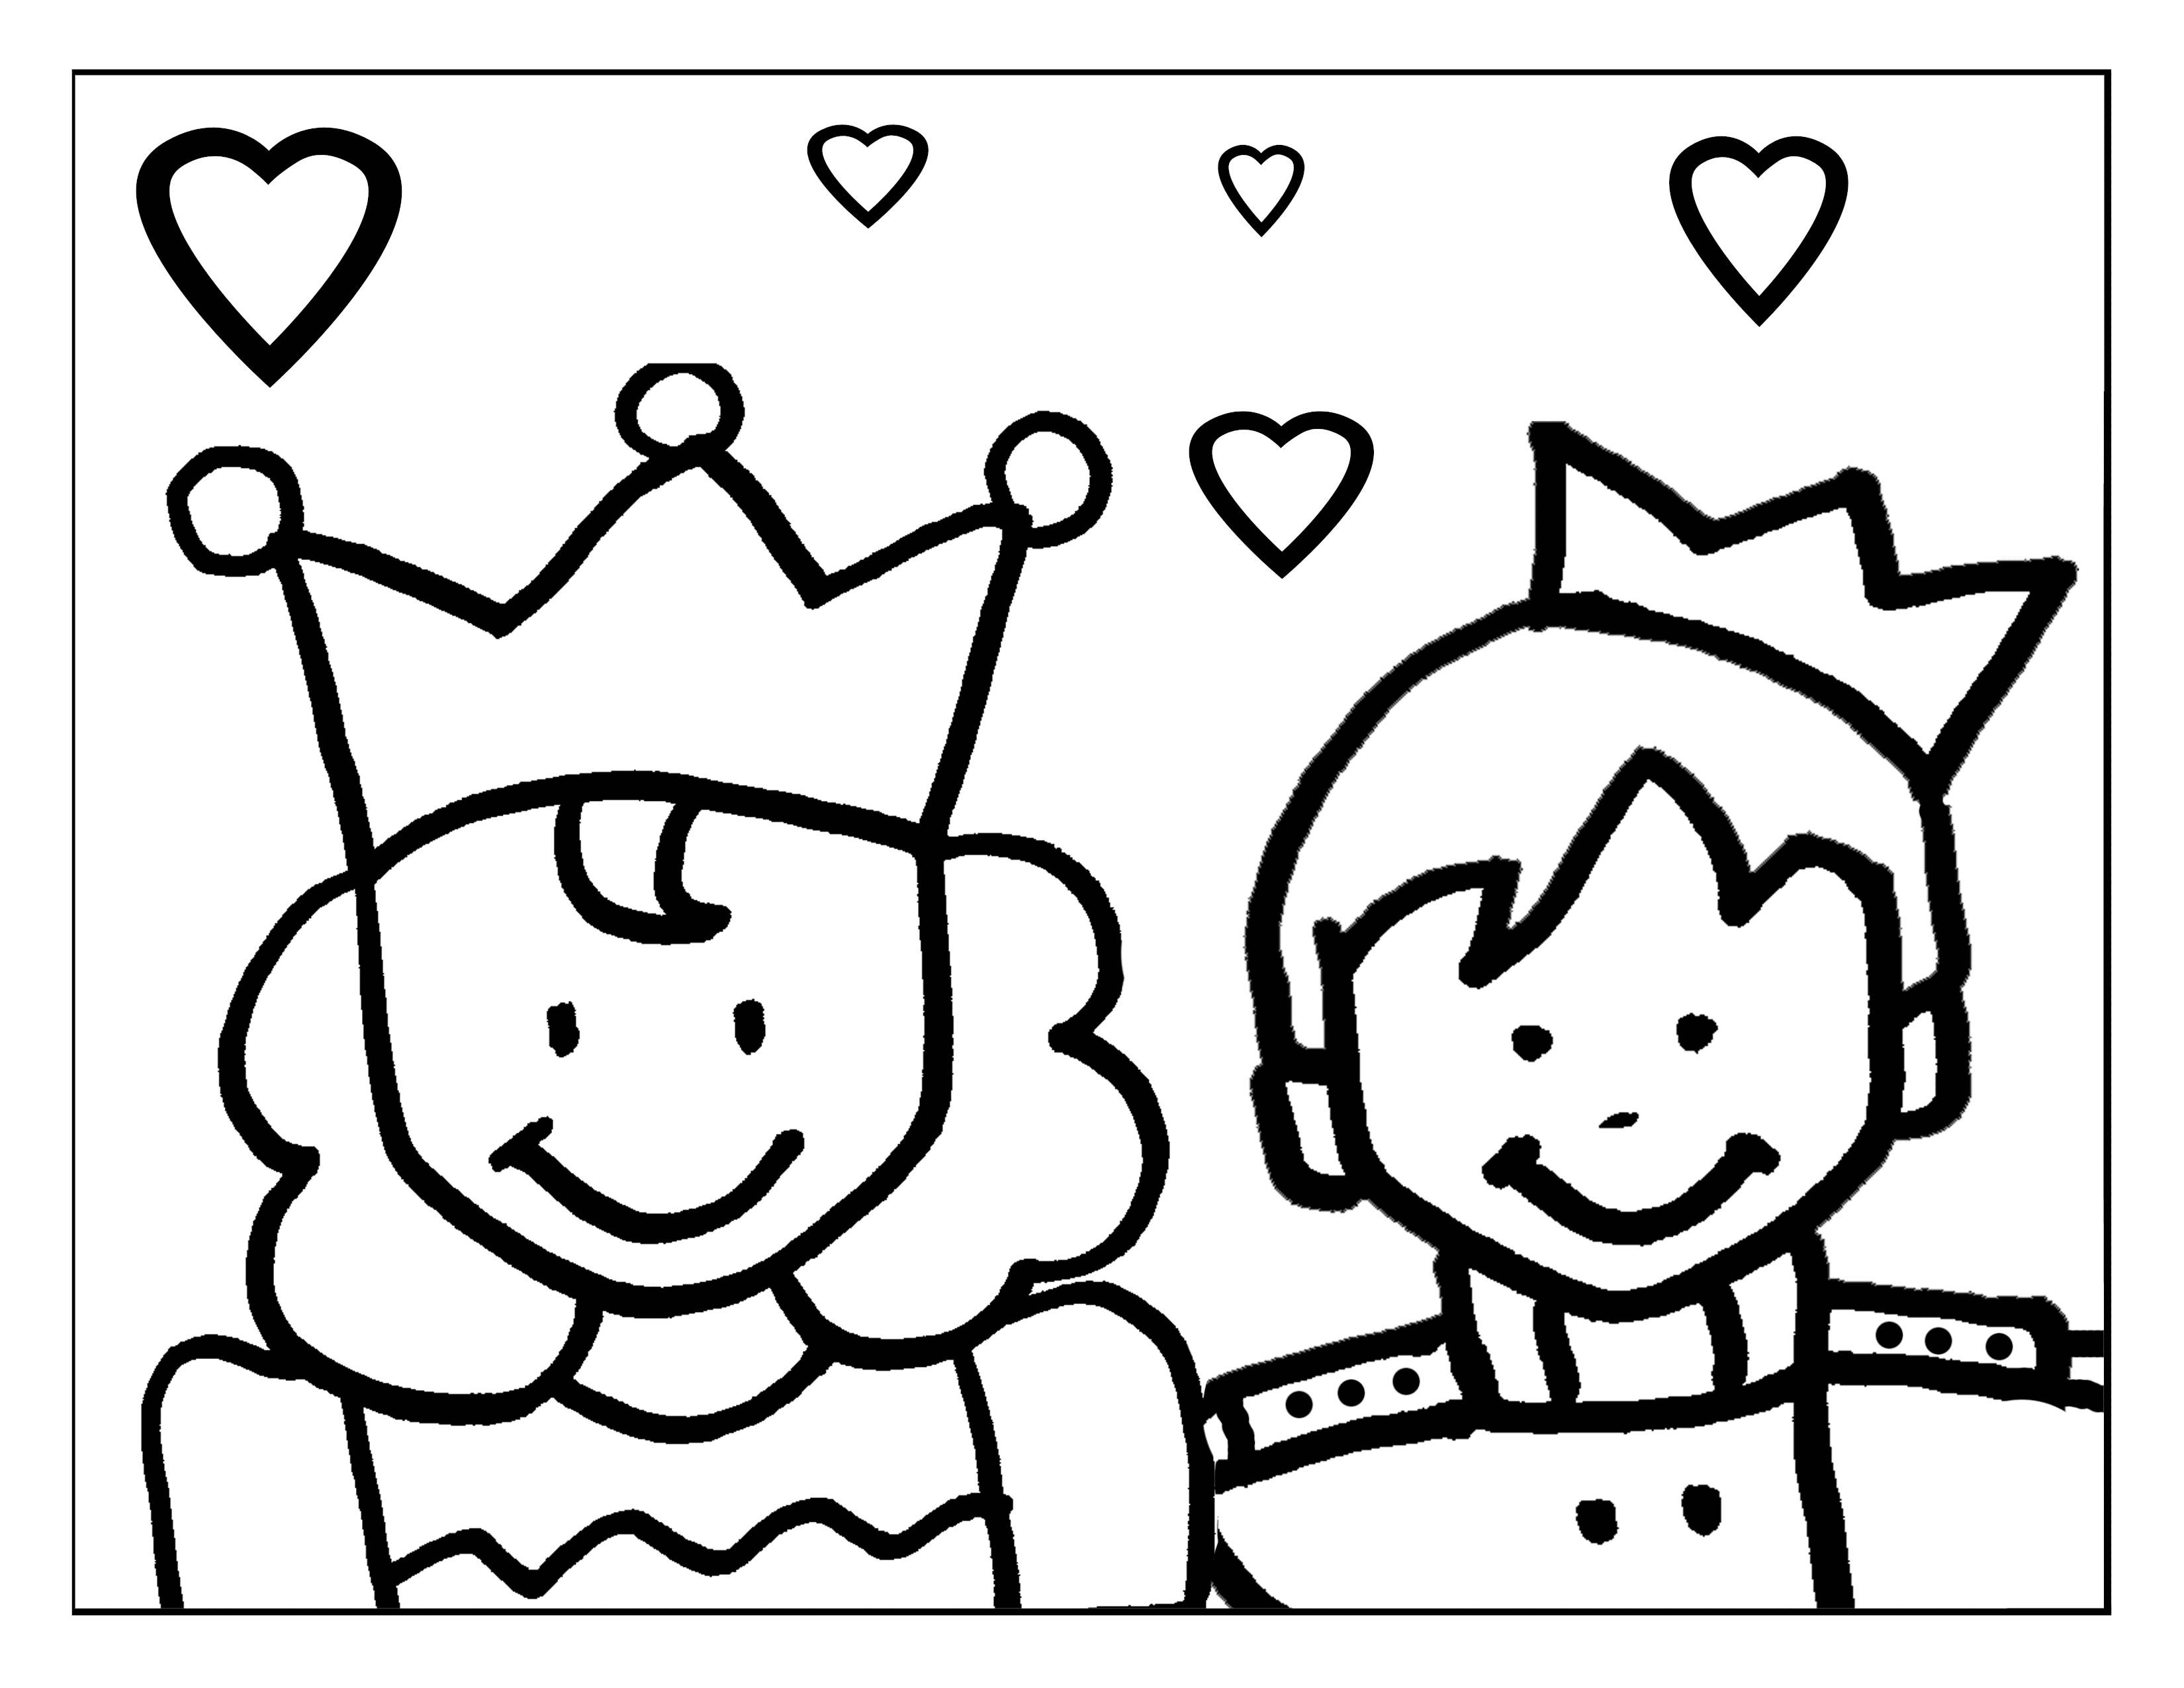 El pr ncipe archimboldo cuento maravilloso revista - Prince et princesse dessin ...